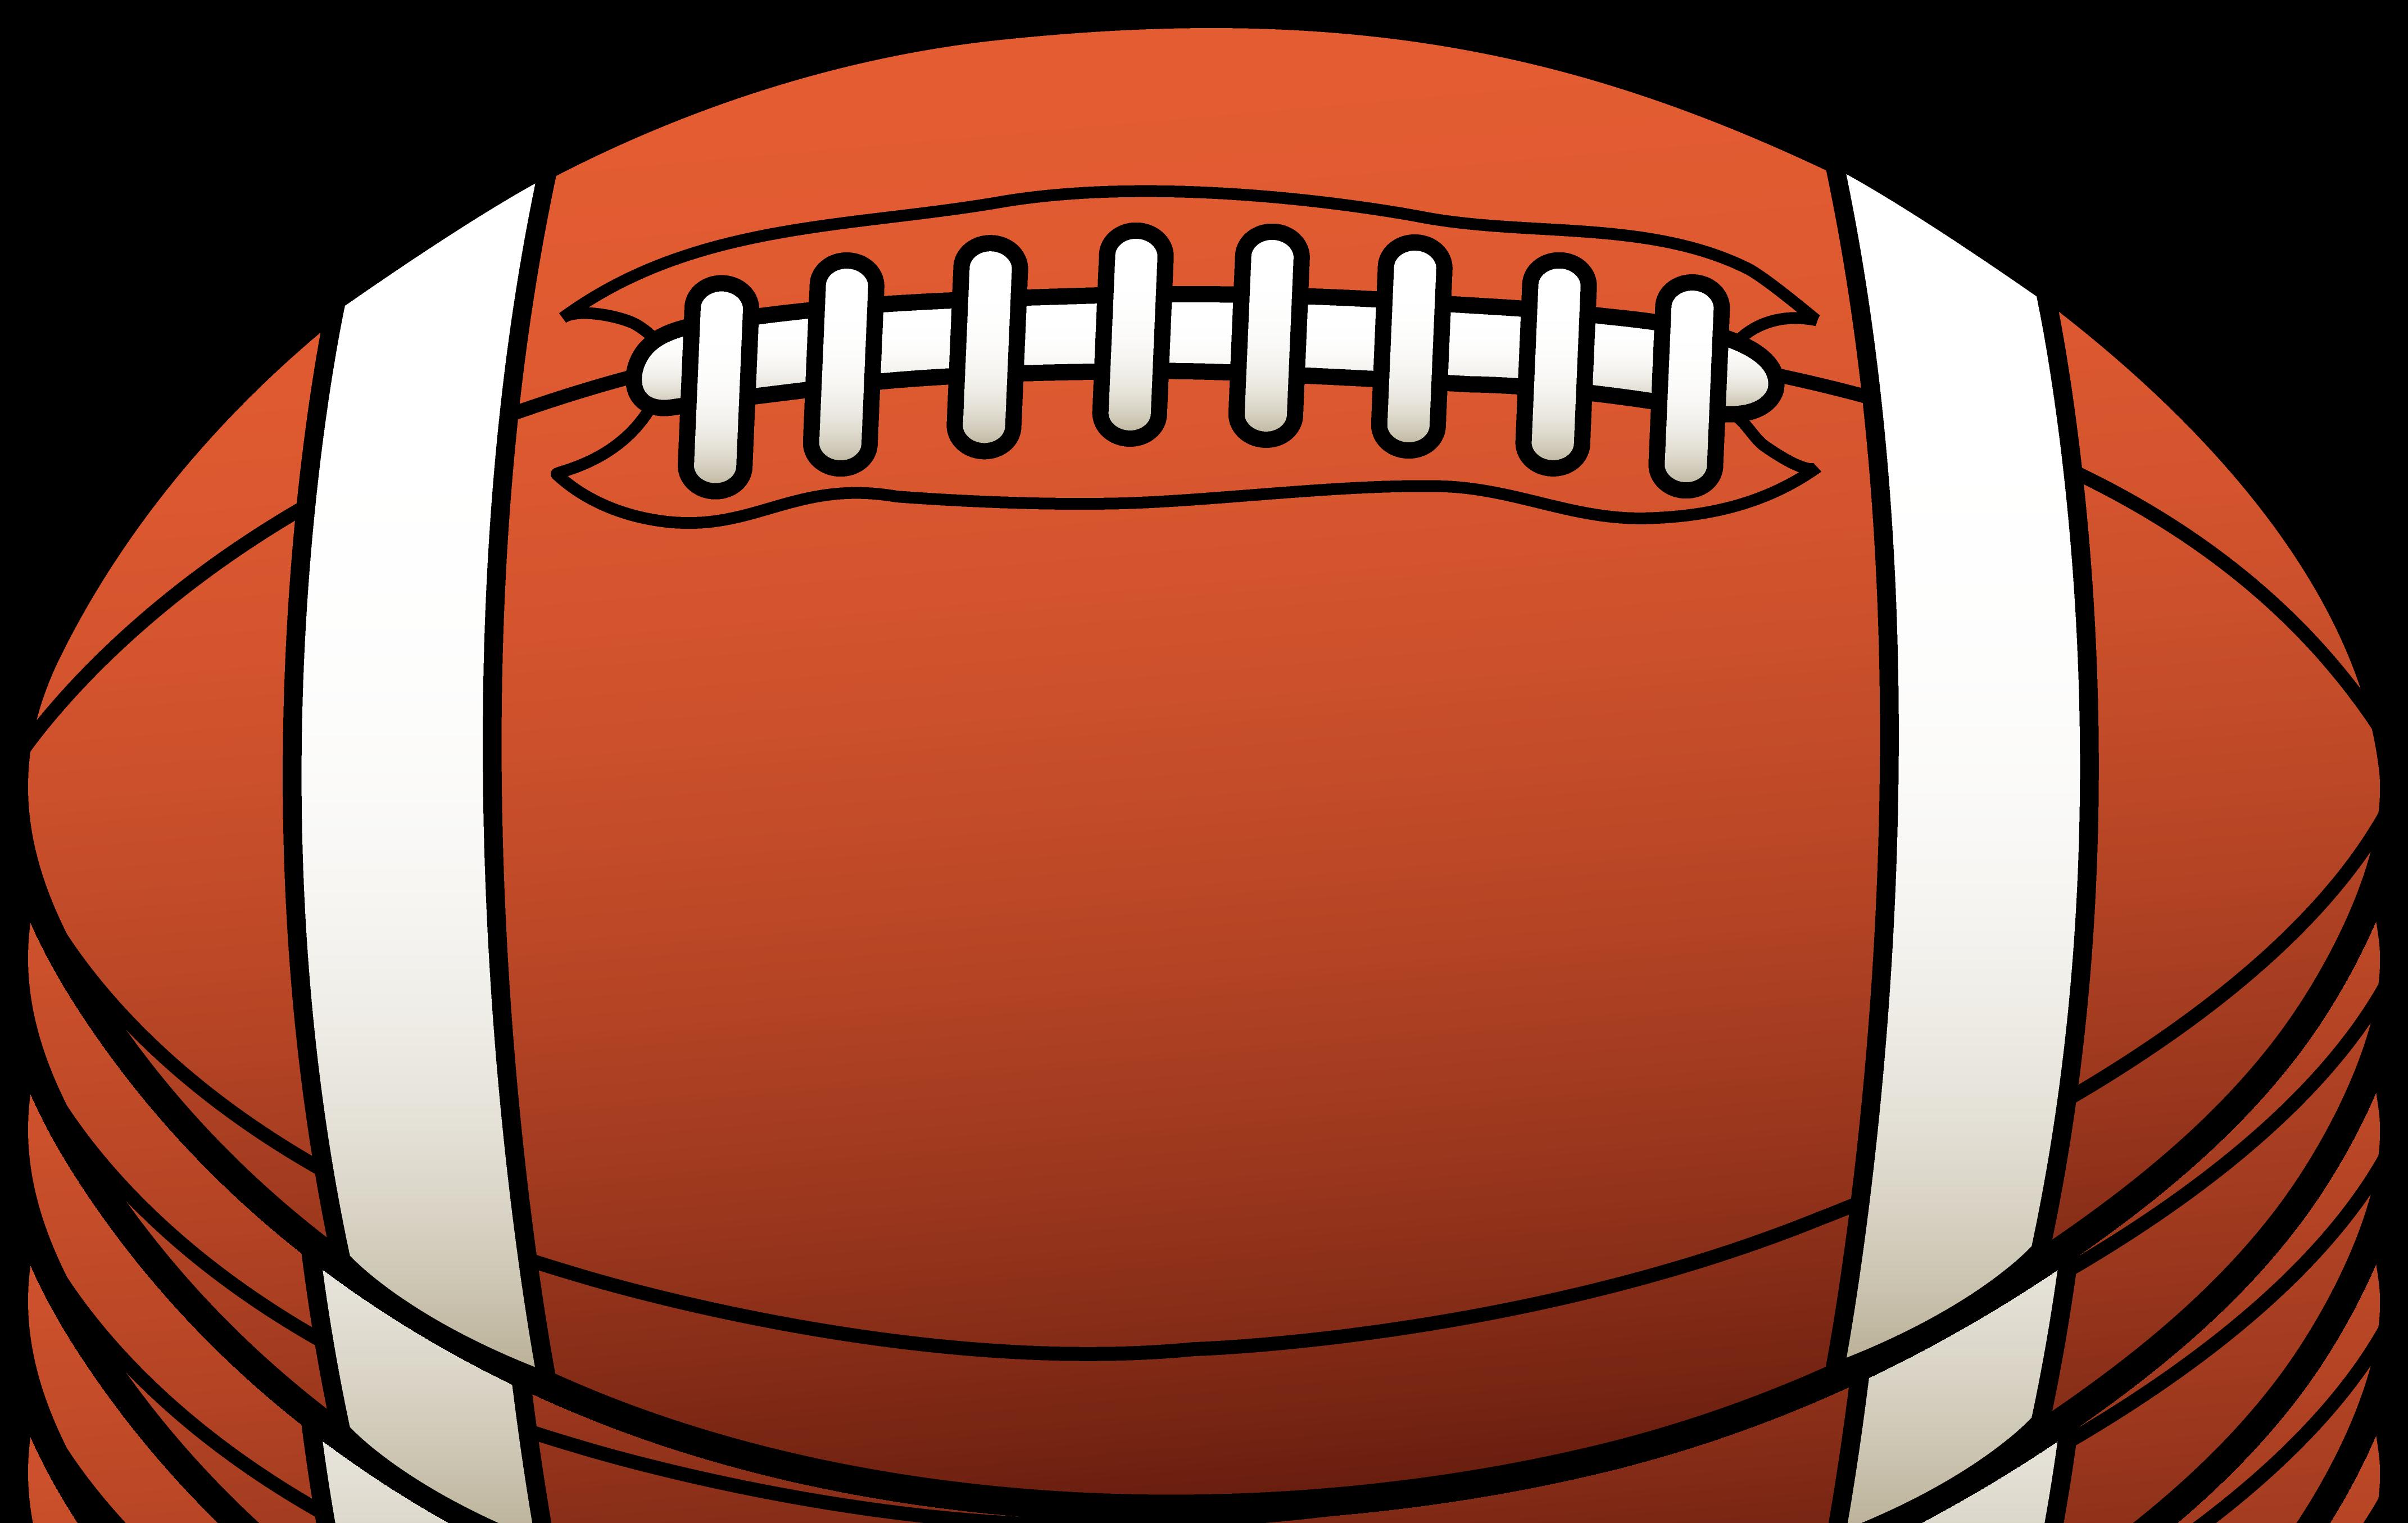 4285x2710 Ball Clipart Rugby League